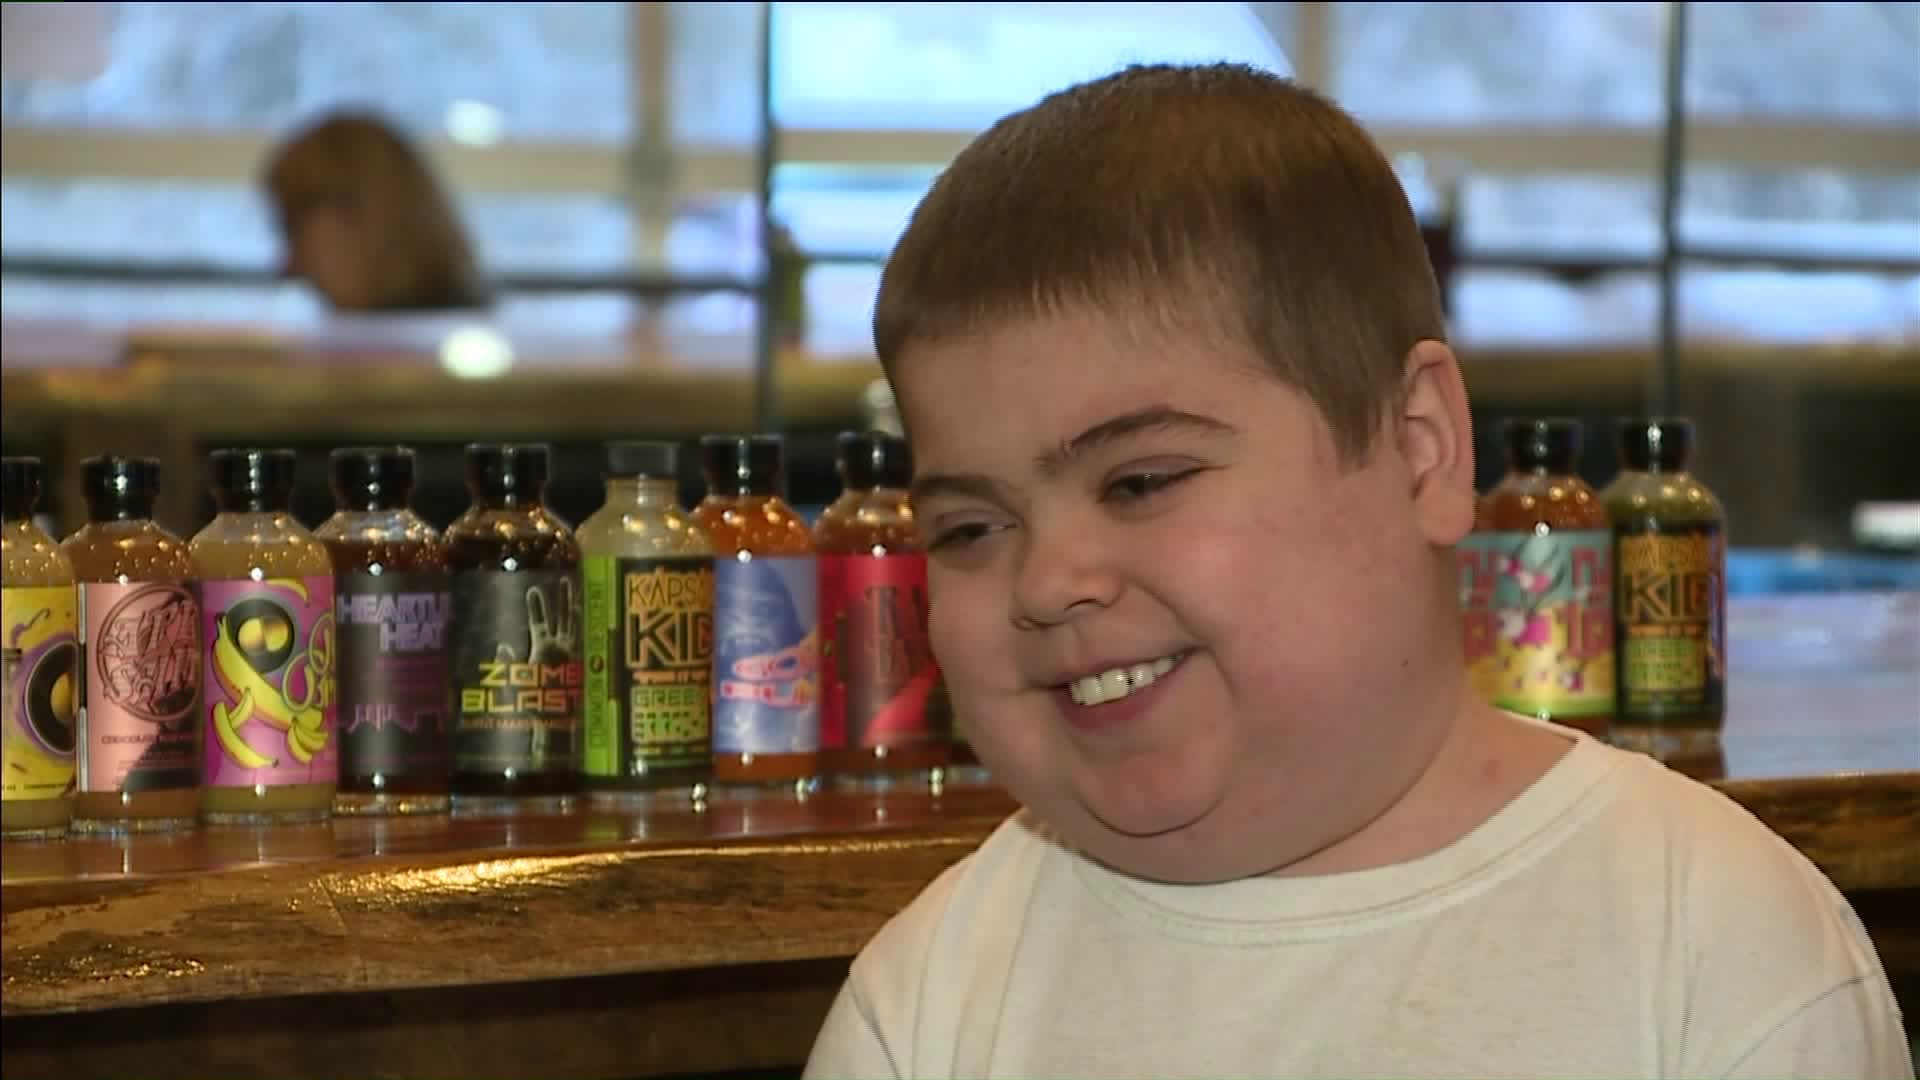 10-year-old Kansas City internet sensation in need of heart transplant | FOX 4 Kansas City WDAF-TV | News, Weather, Sports